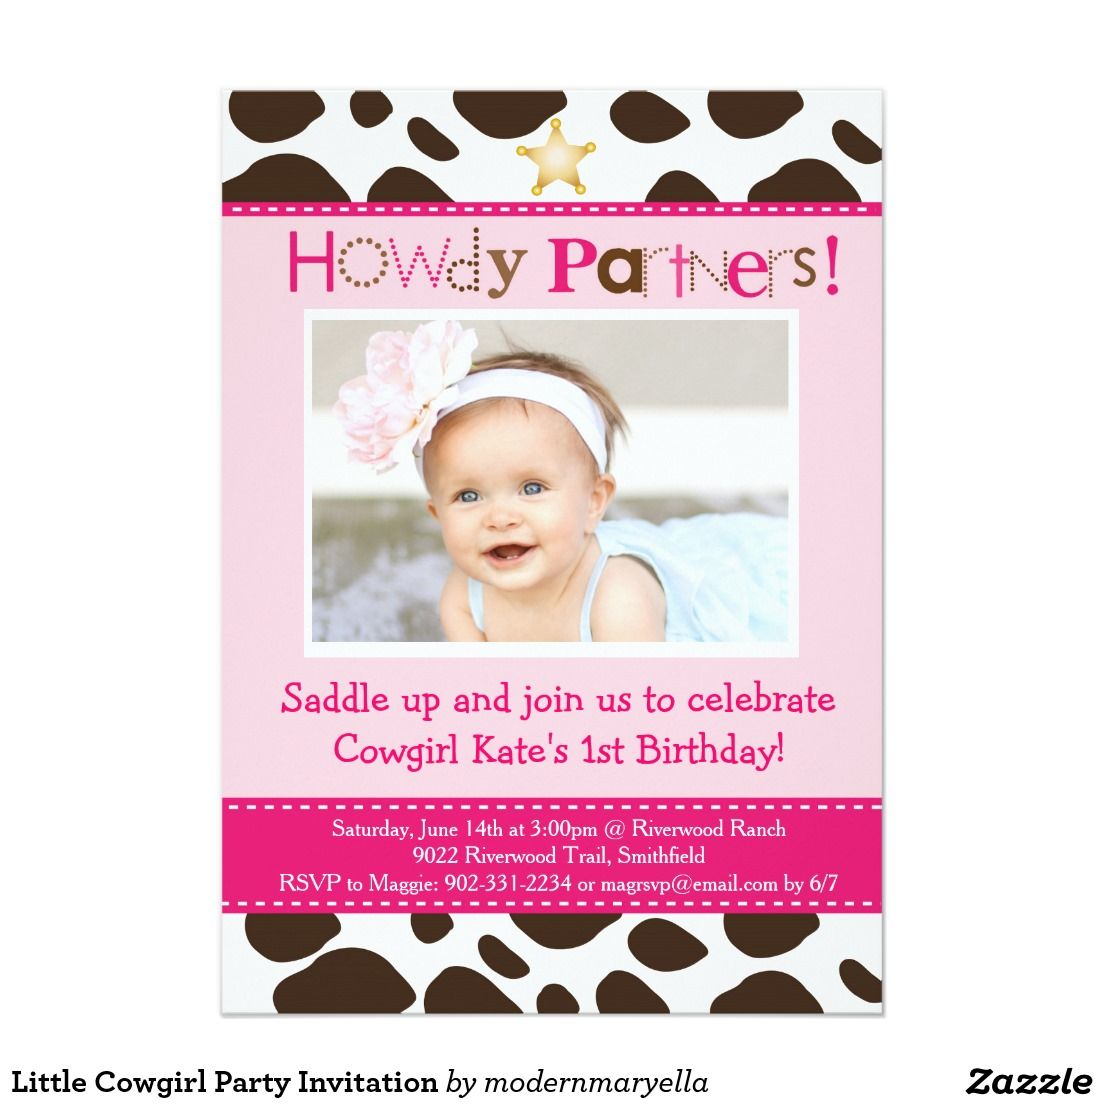 Little Cowgirl Party Invitation | Invitations | Pinterest ...